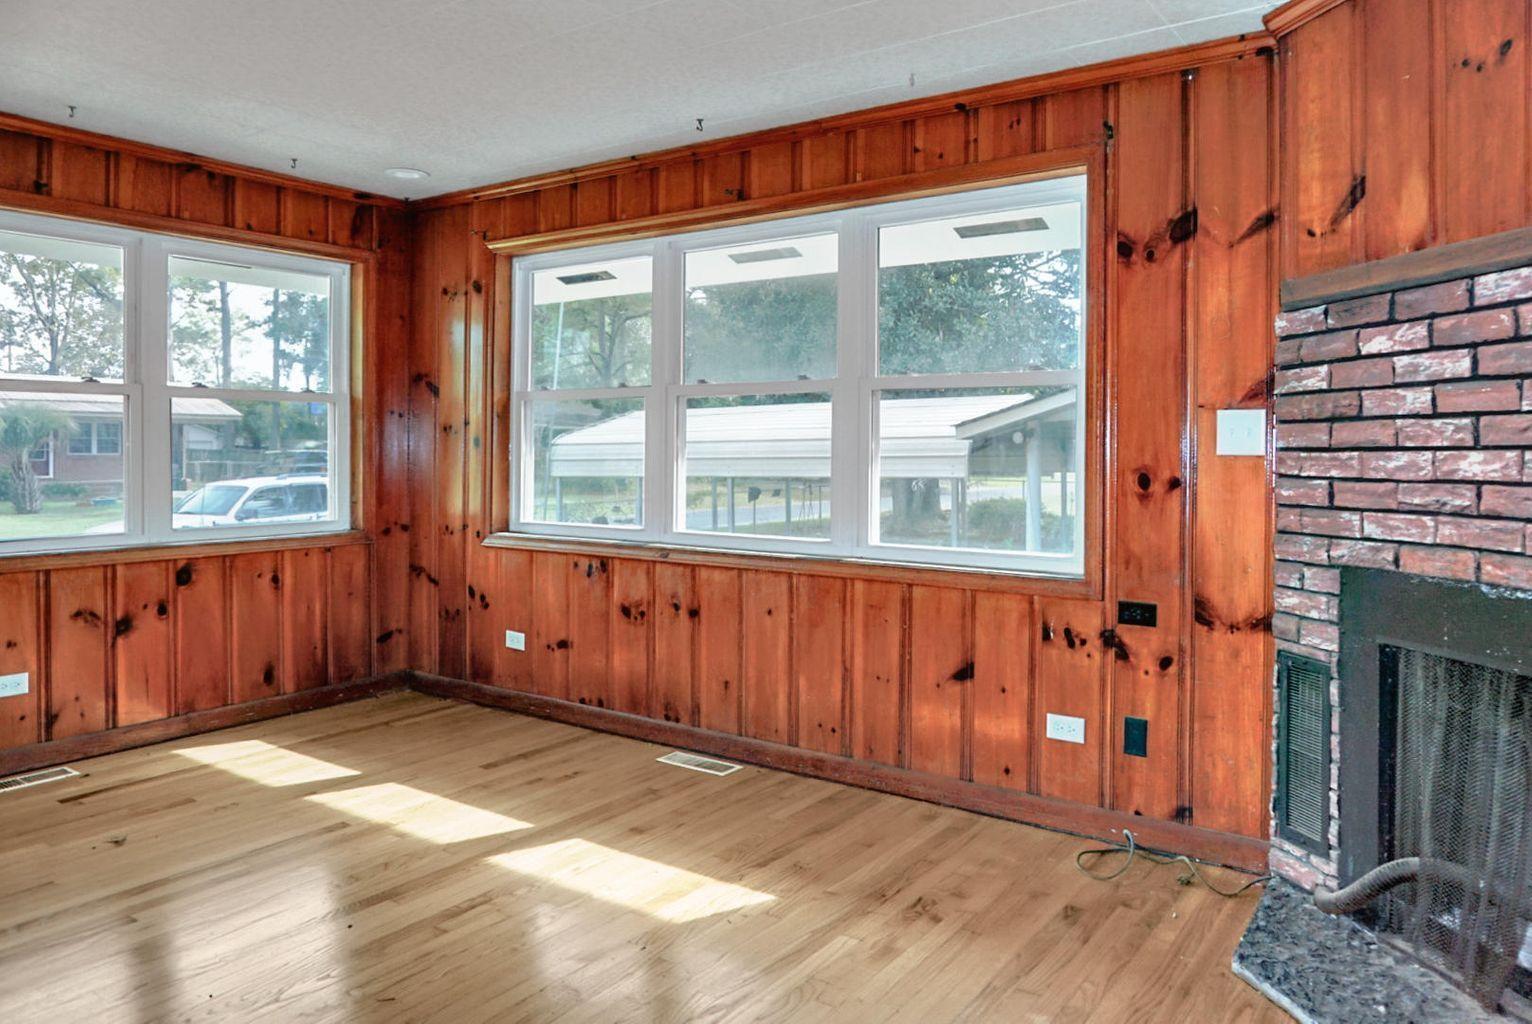 Owens Homes For Sale - 114 Owens, Summerville, SC - 9